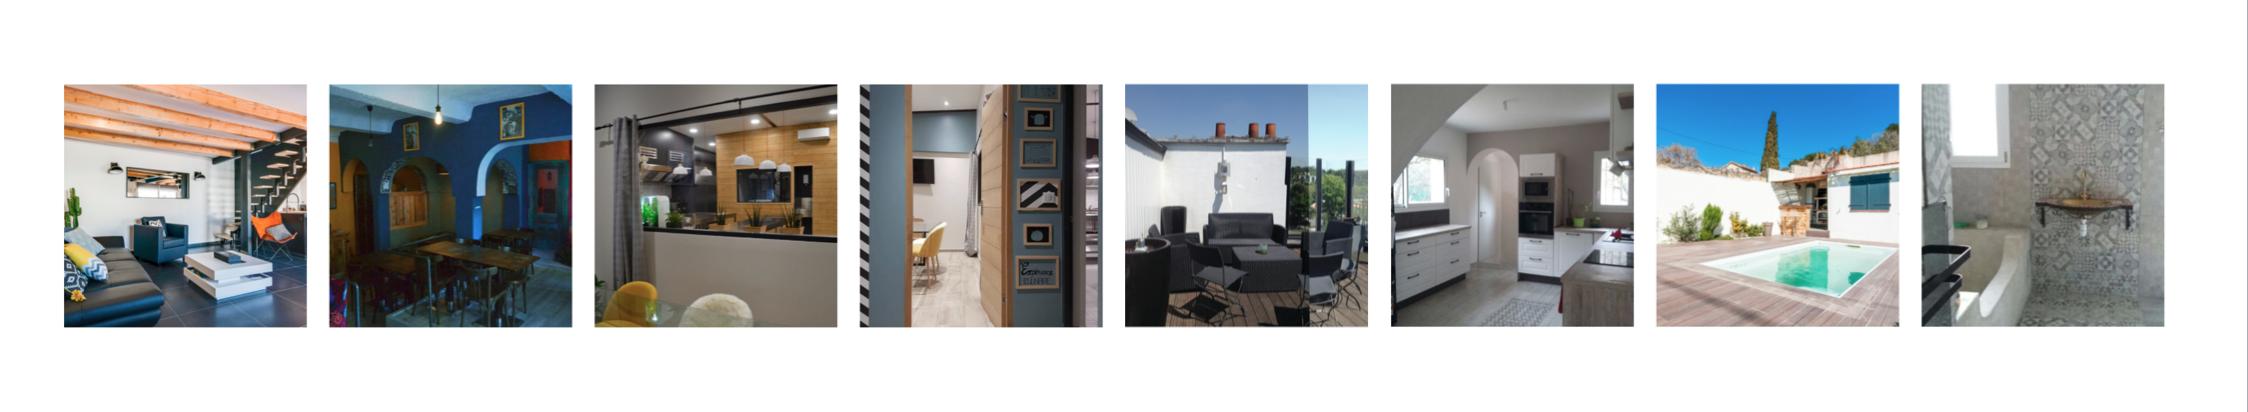 decorateur aix en provence formation dcoration intrieure paris et aix en provence dcoration de. Black Bedroom Furniture Sets. Home Design Ideas